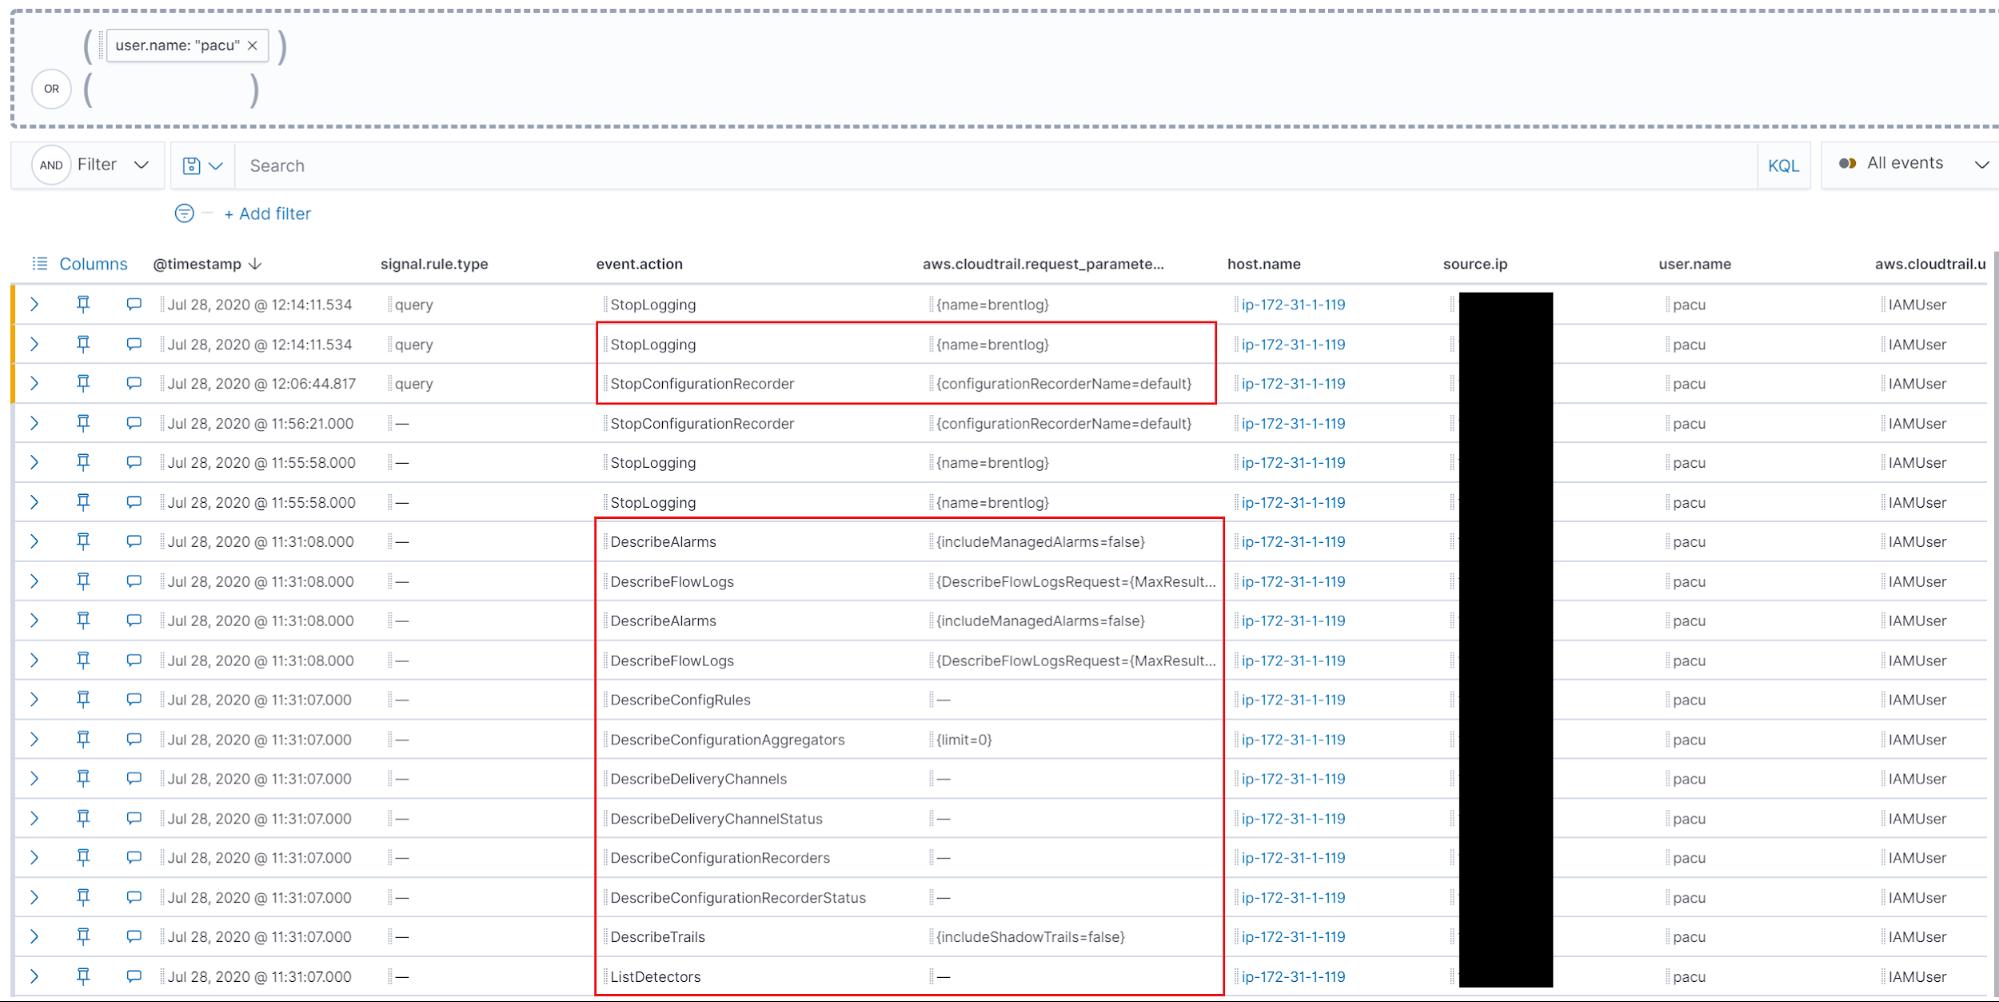 9-event-history-blog-secops-cloud-platform-monitoring.png